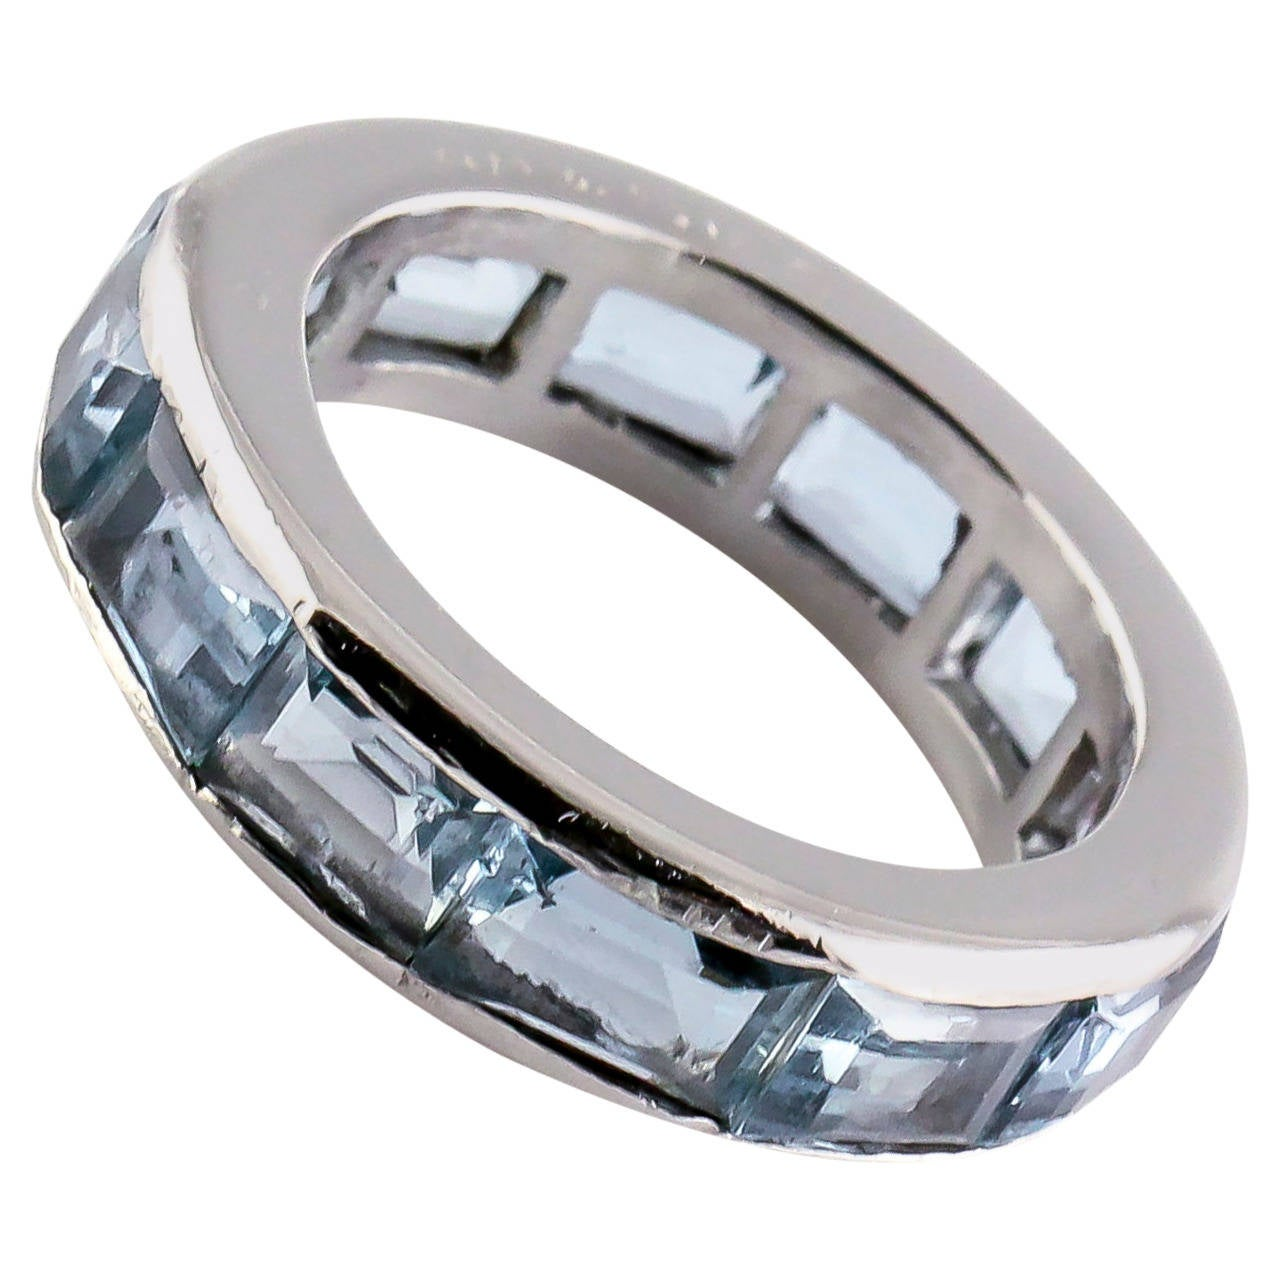 id j aquamarine wedding rings Oscar Heyman Aquamarine Platinum Band Ring 1